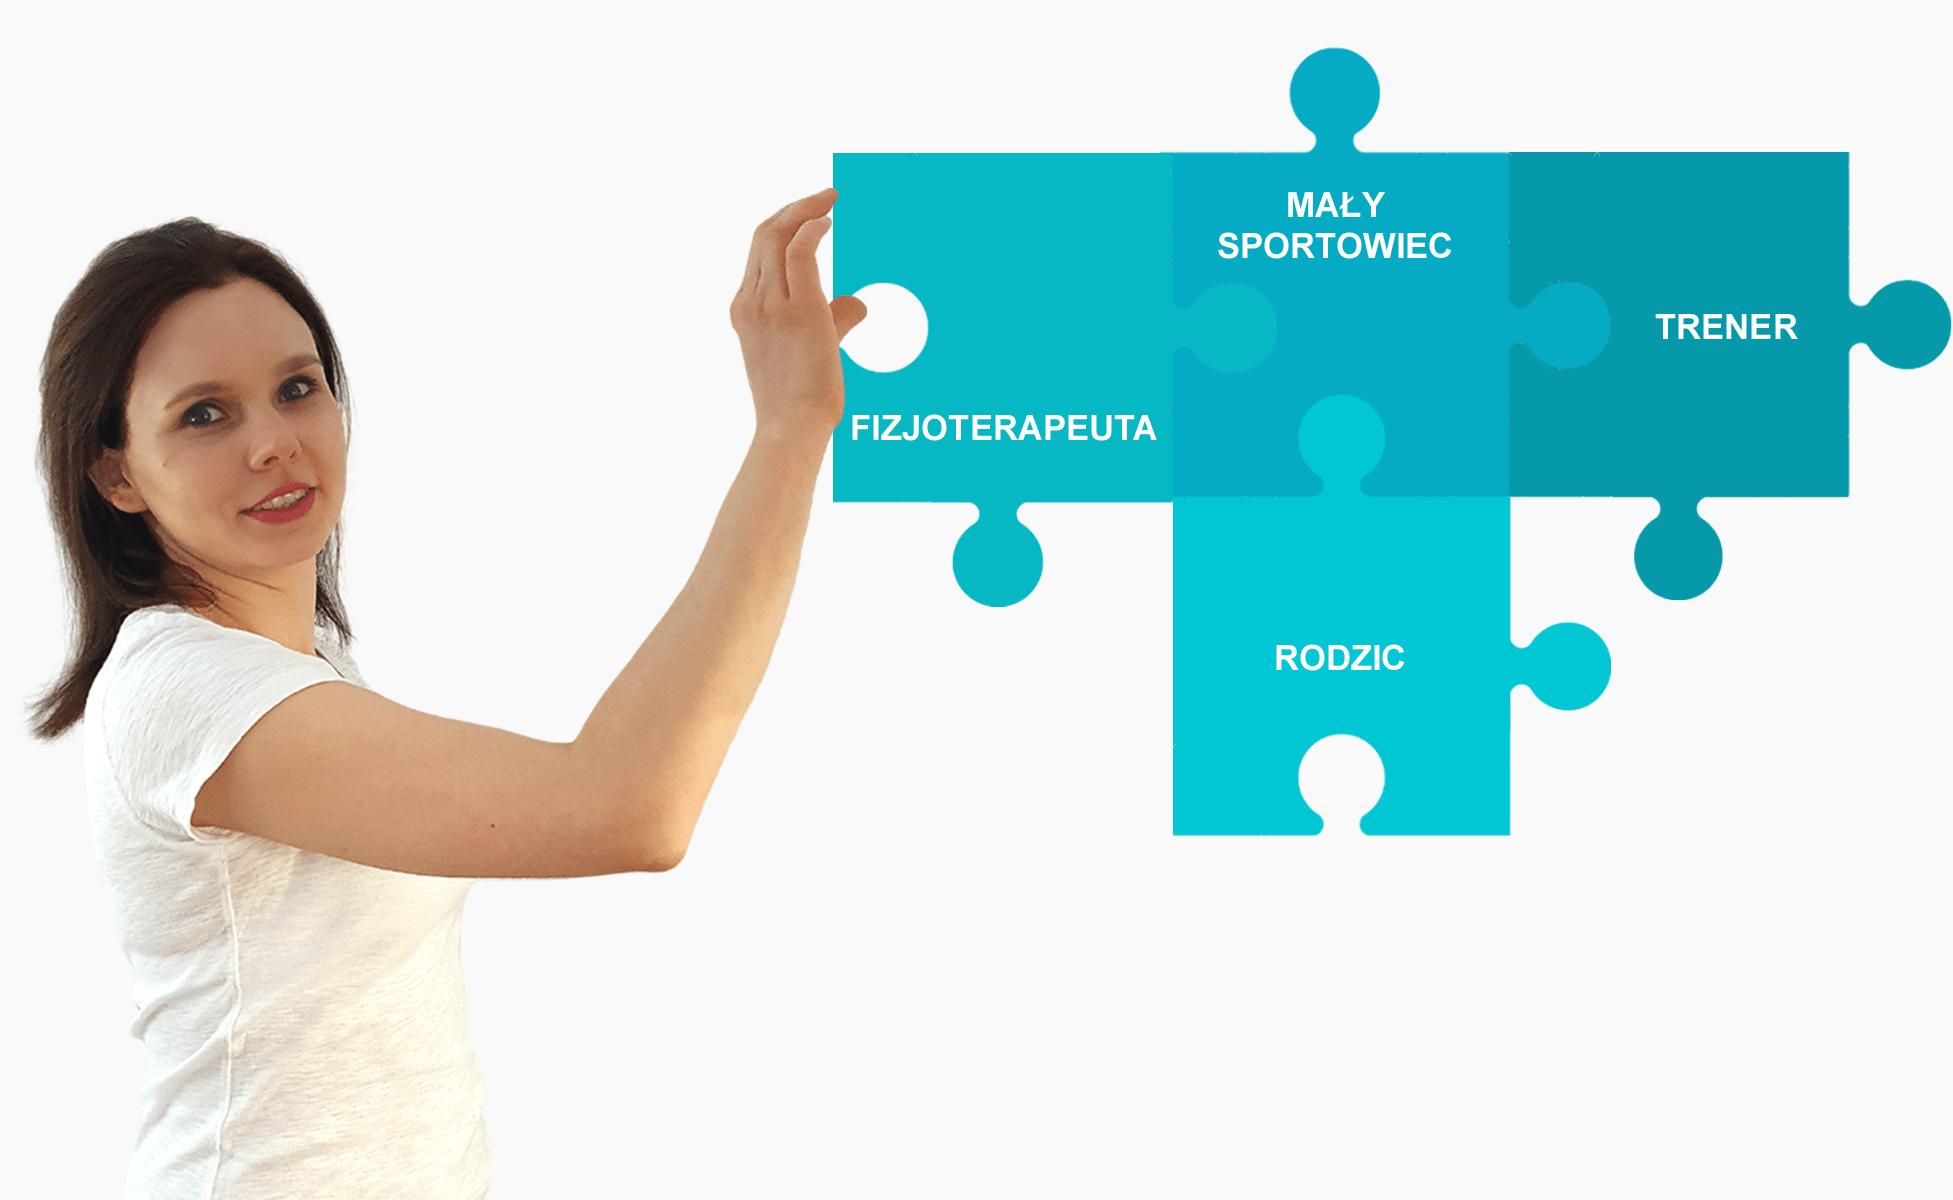 edyta-lukasik-fizjoterapia